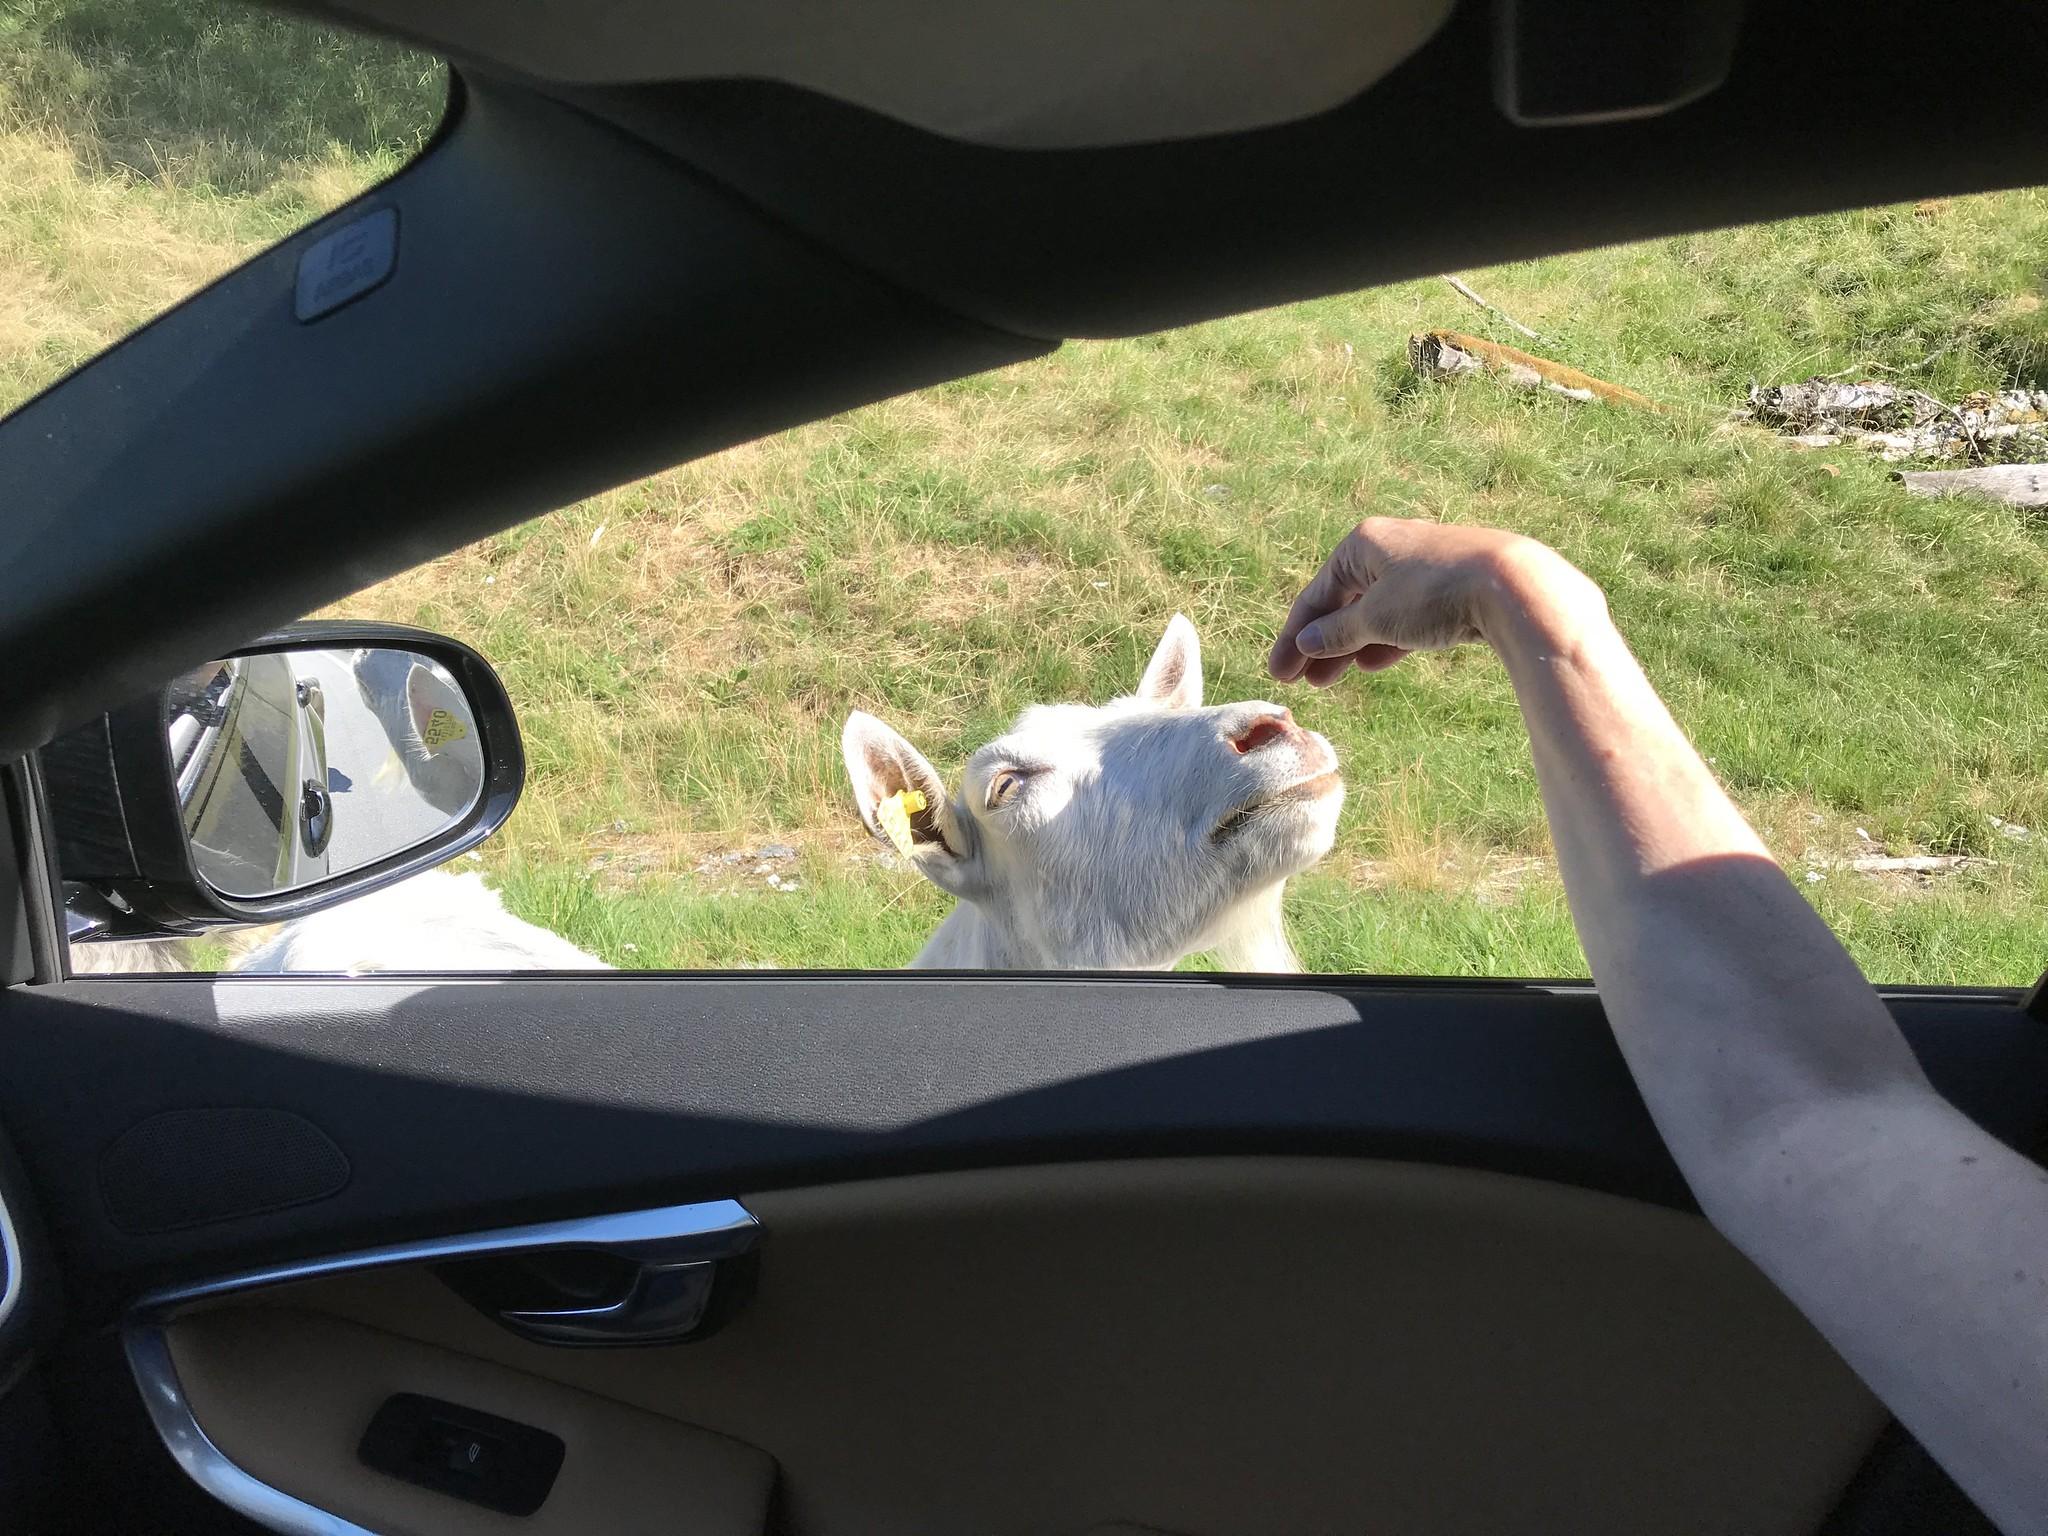 Goat Jam